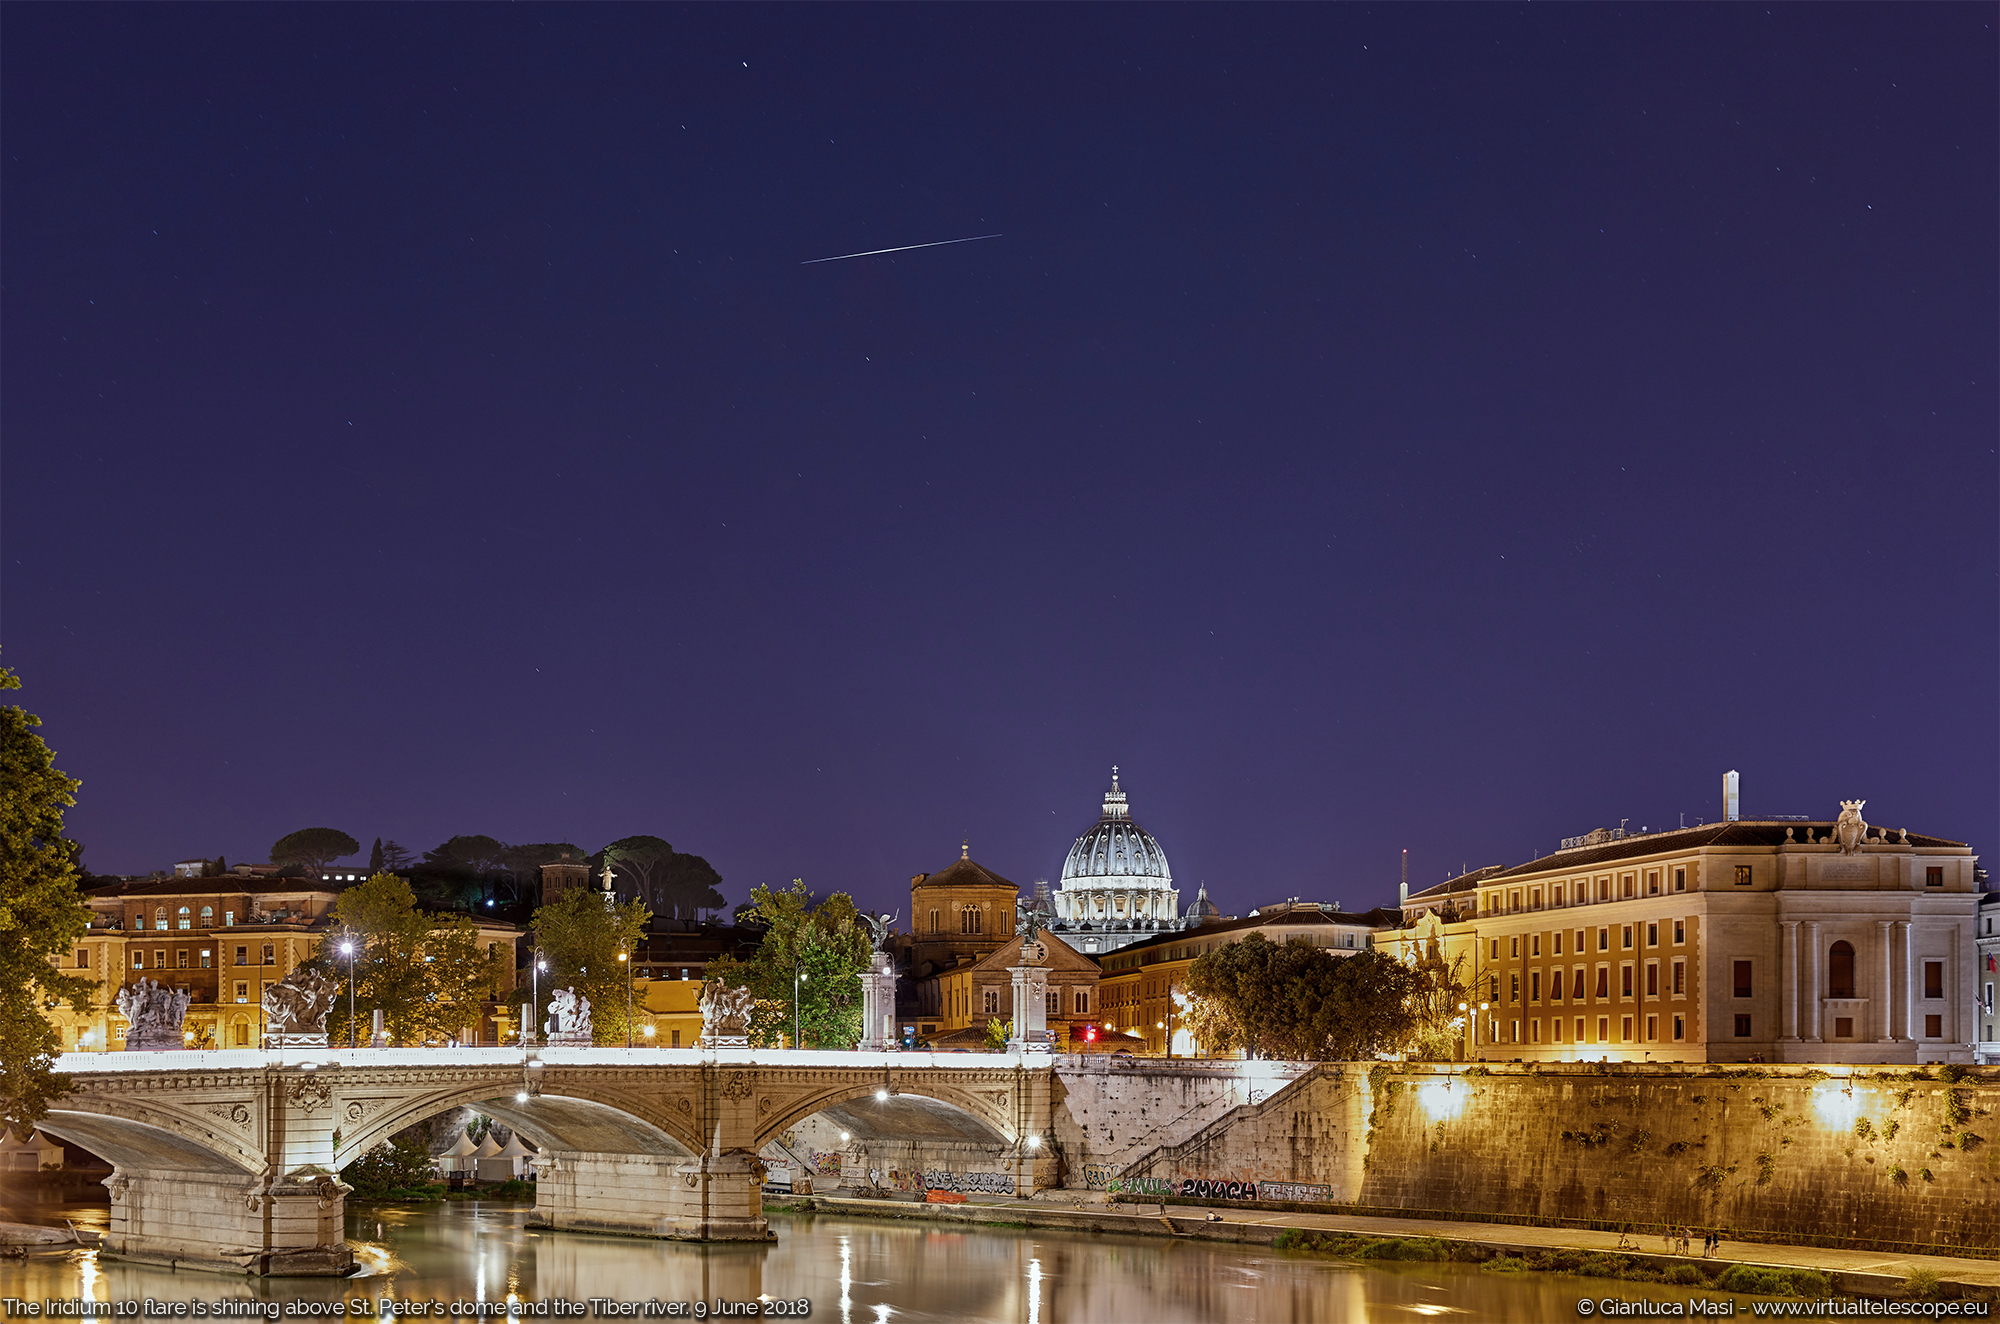 Satellite Iridium 10 made a very bright flare above Rome on 9 June 2018